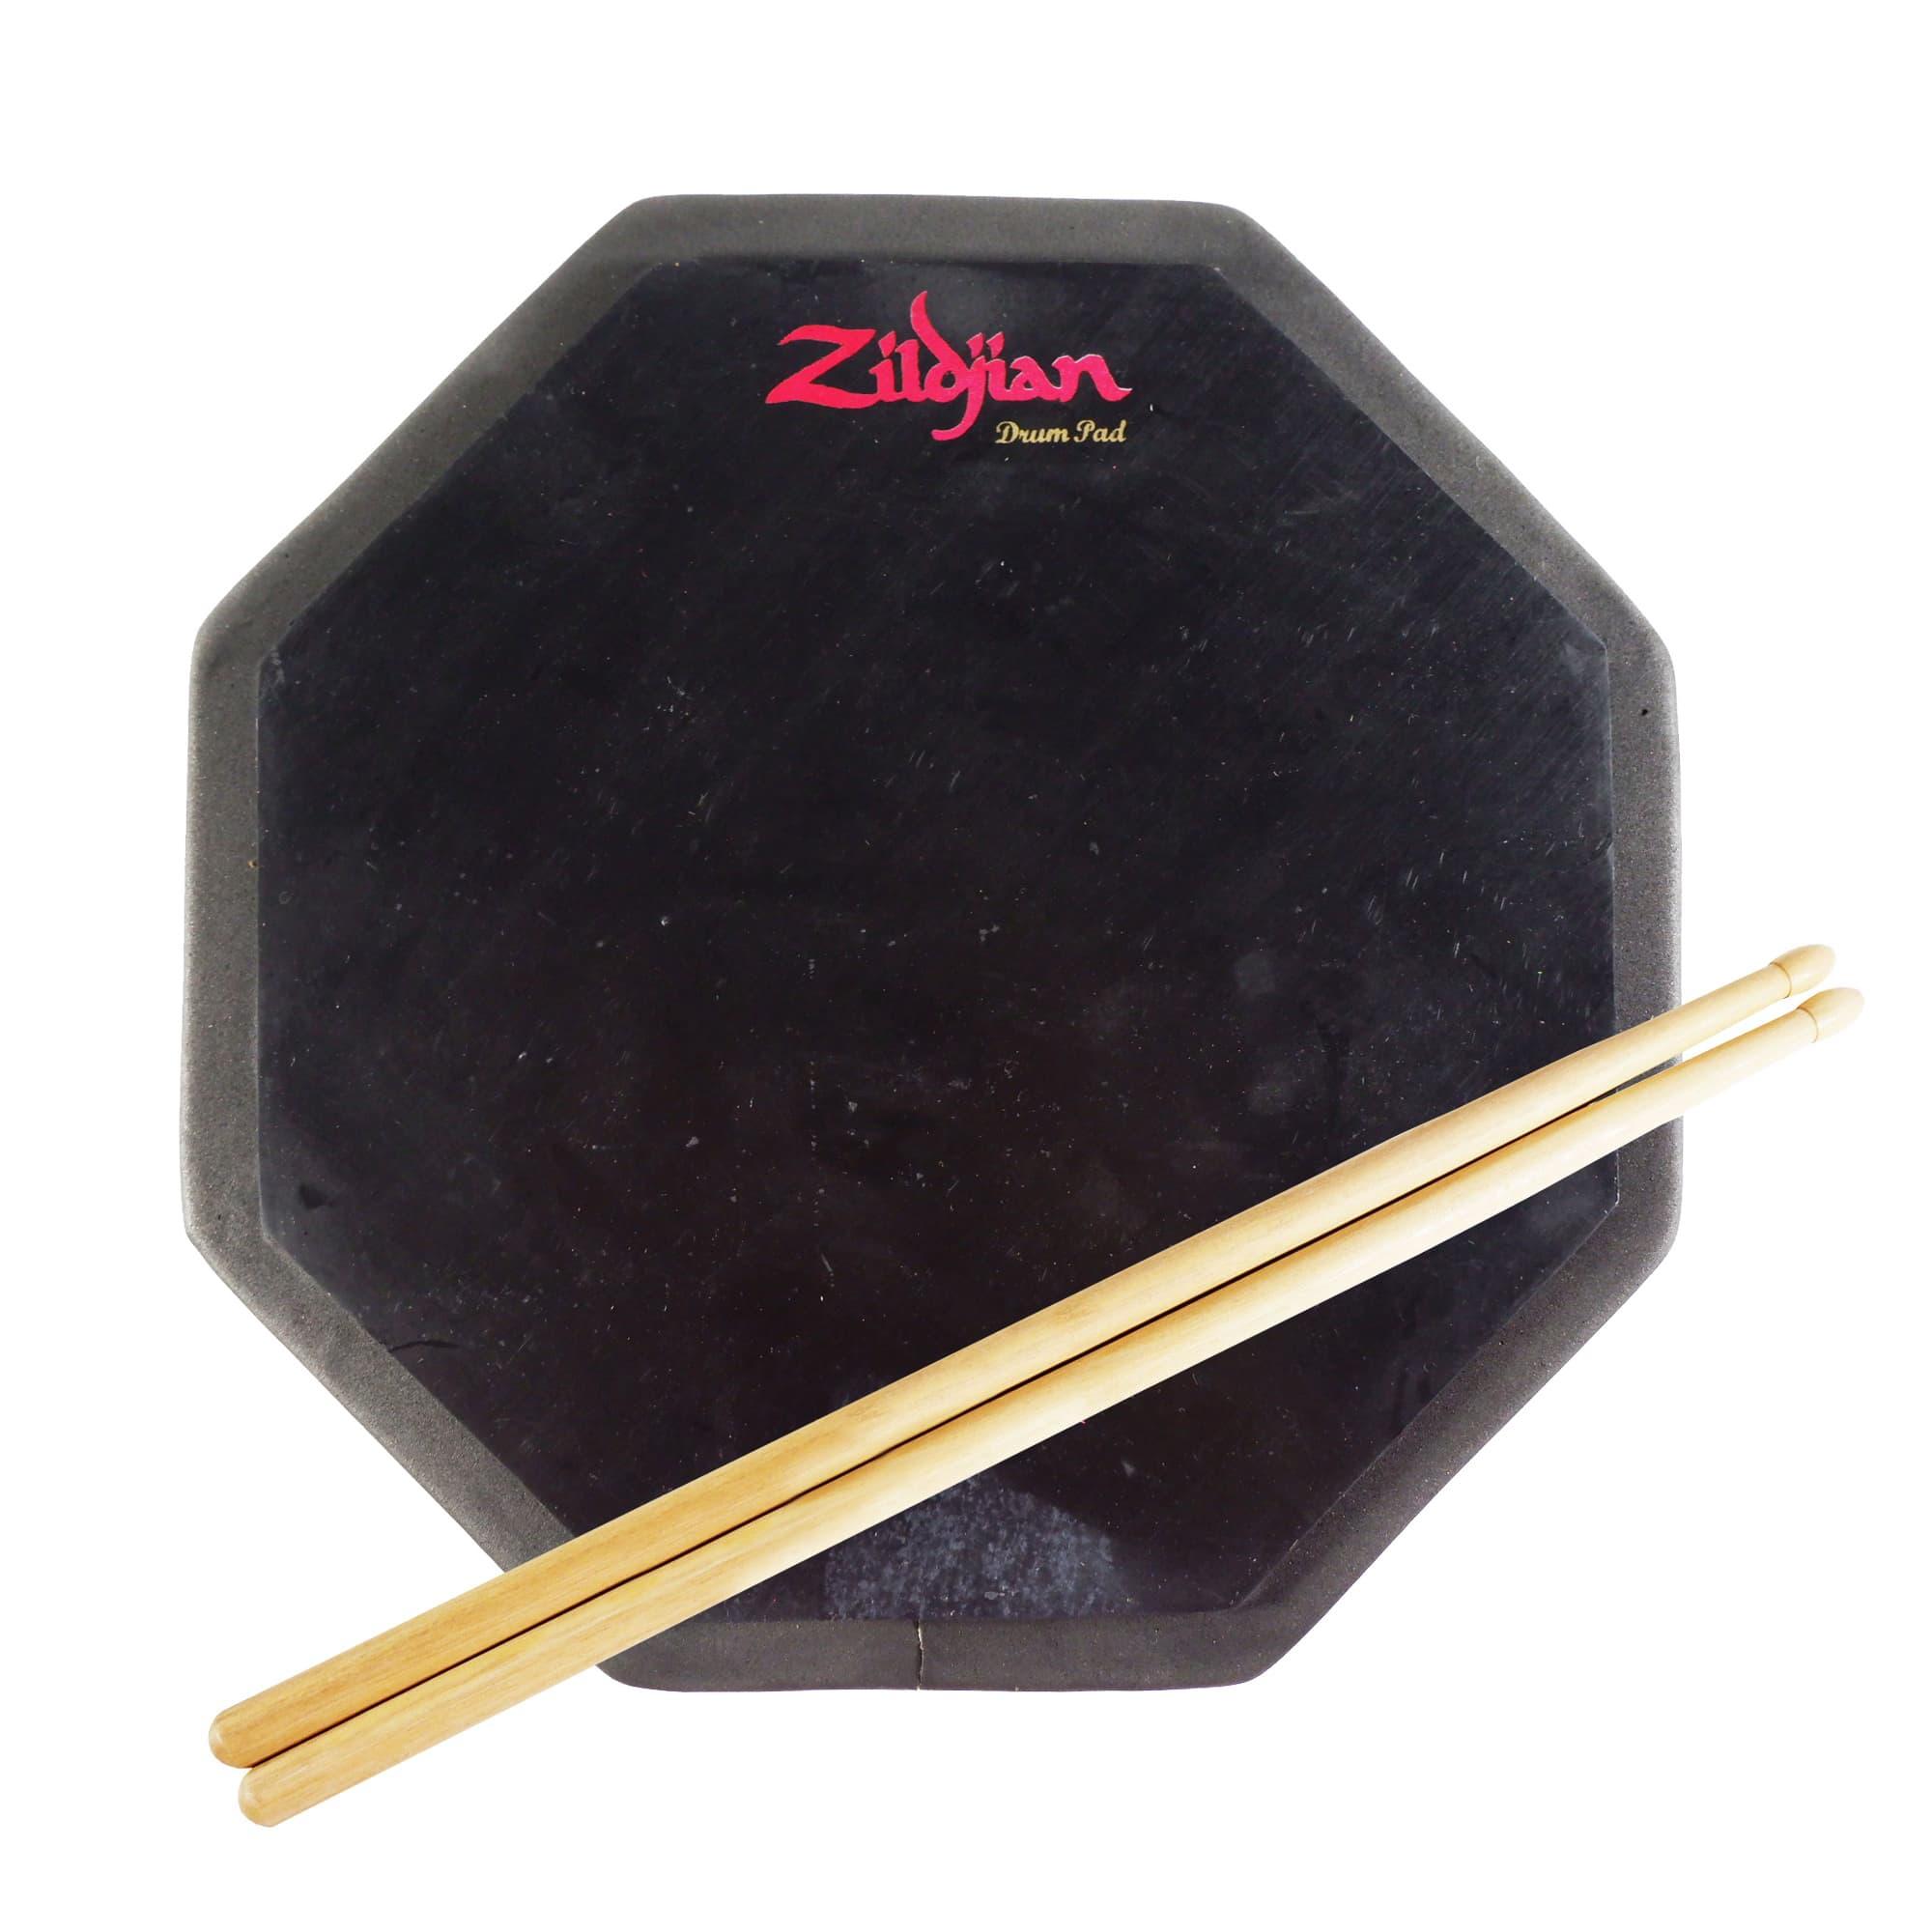 harga Drum Pad 10 Inch & Stick Drum (zildjian / Tama / Sonor) Blanja.com